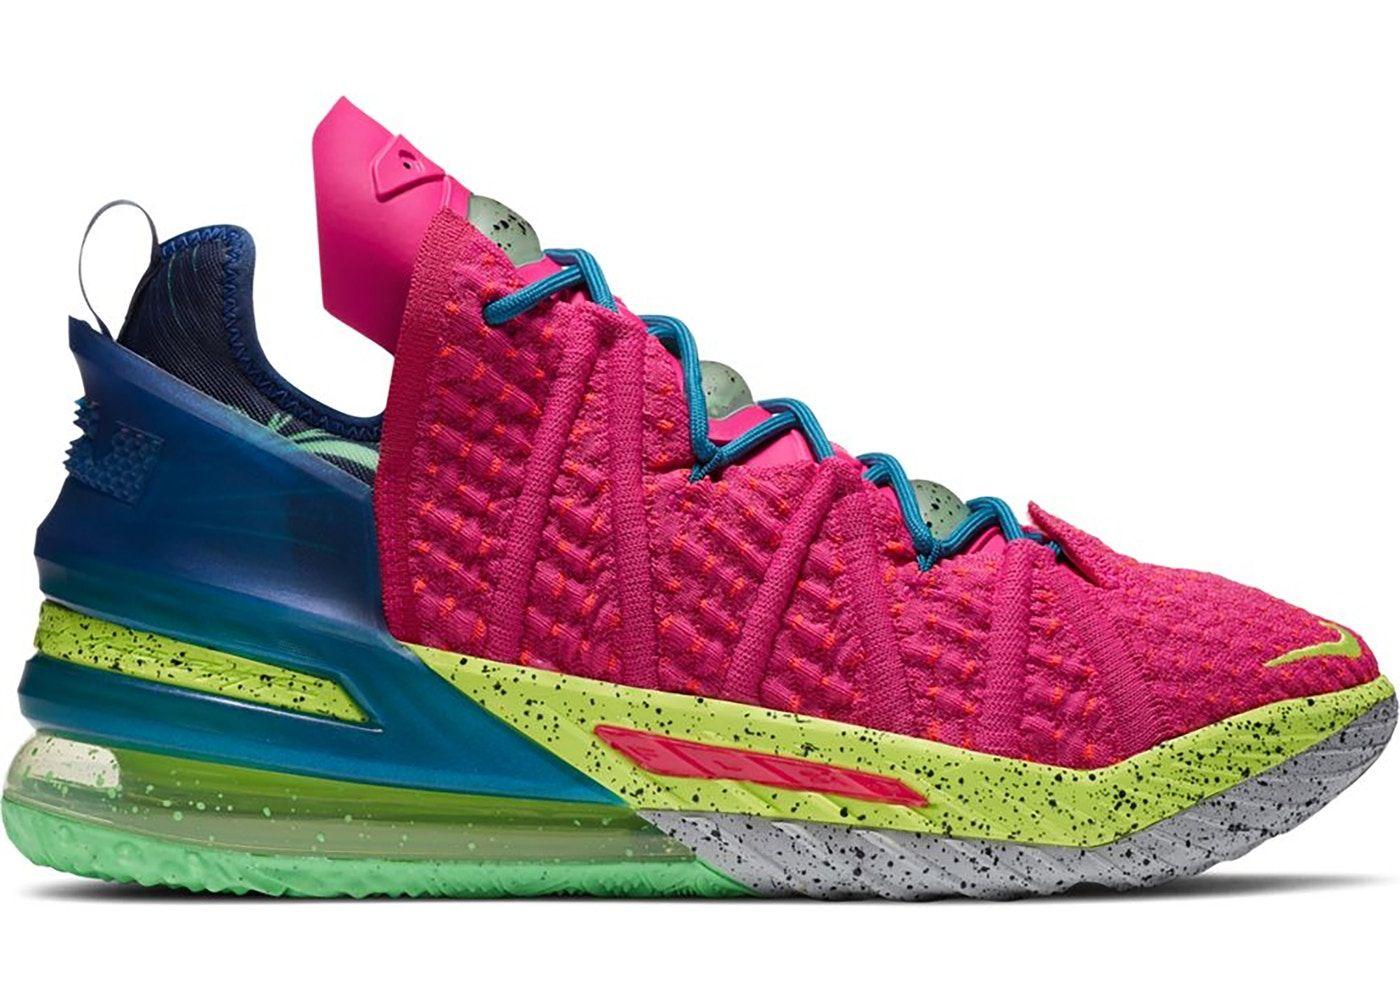 Nike Lebron 18 Los Angeles By Night In 2021 Nike Lebron Nike Lebron